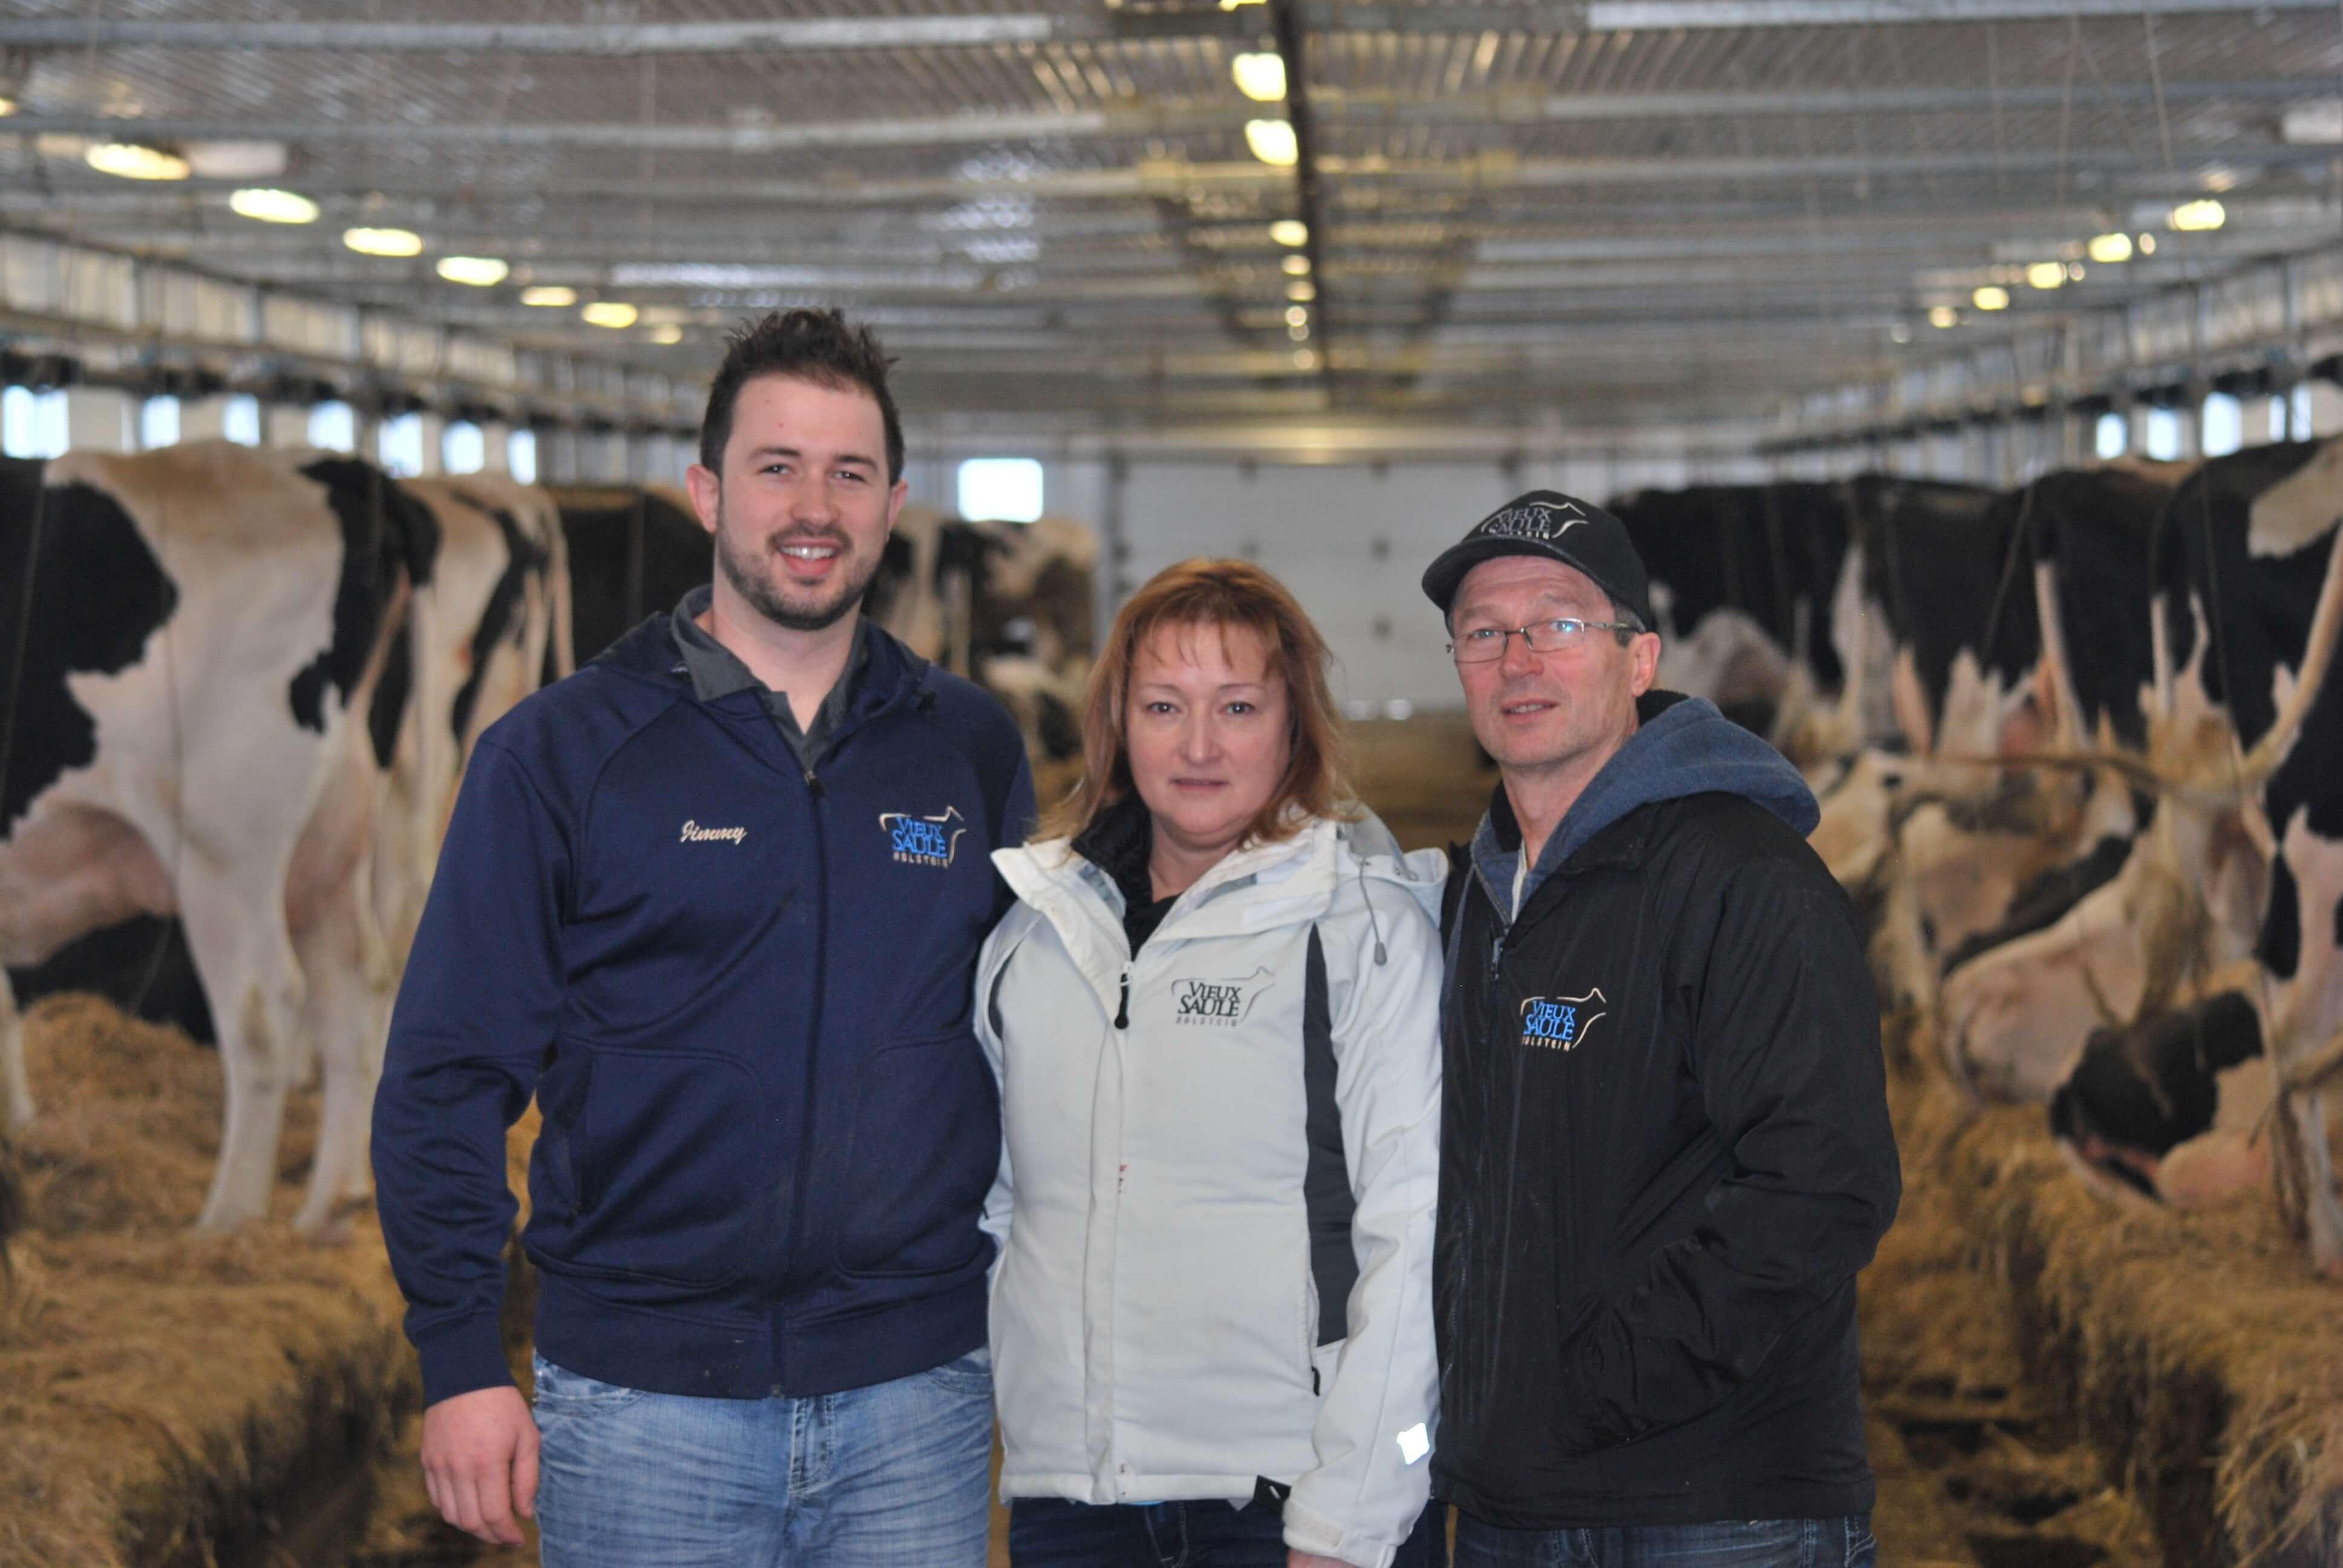 Ferme Vieux Saule Holstein